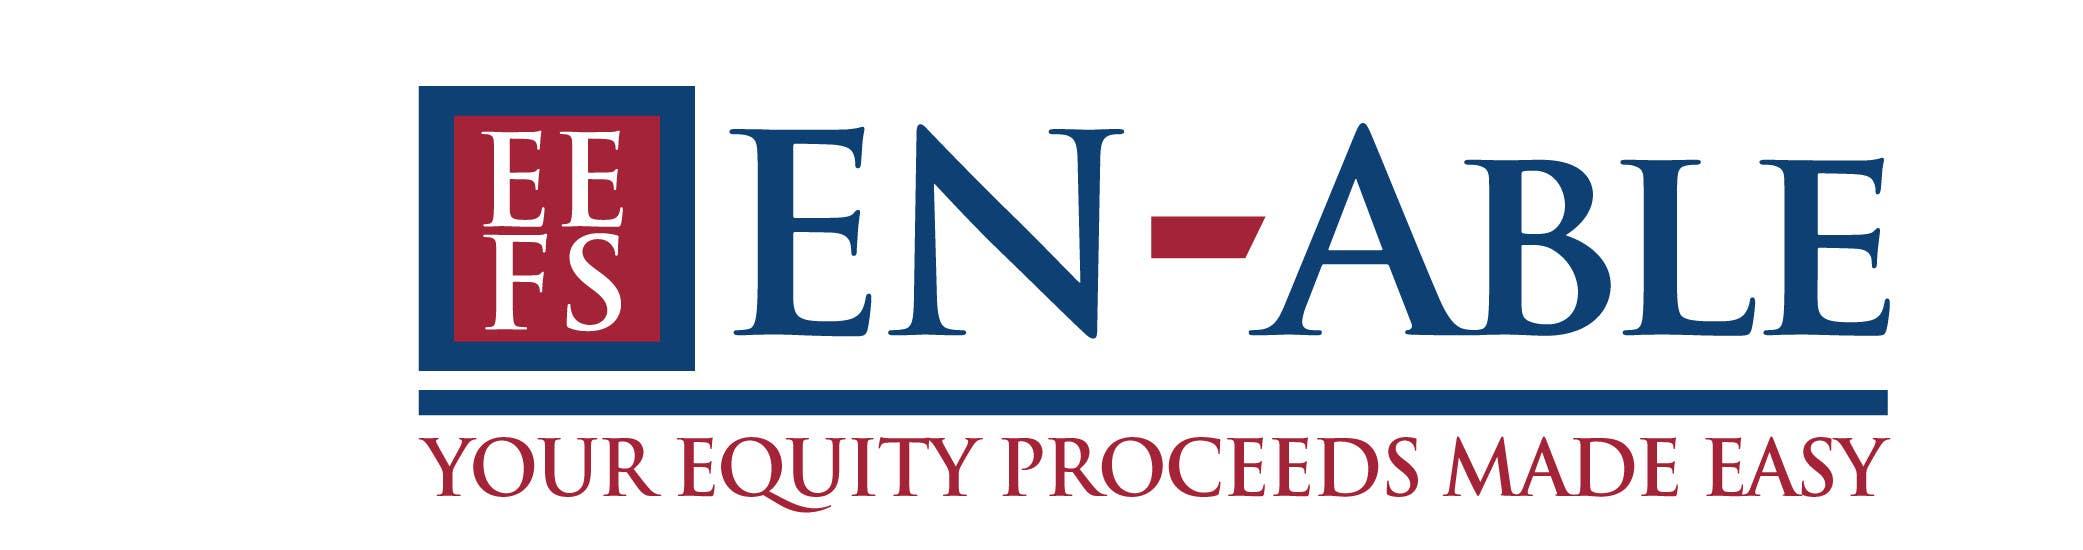 Penyertaan Peraduan #                                        62                                      untuk                                         Design a Logo for EN-Able Equity Funding Solutions (Pty) Ltd